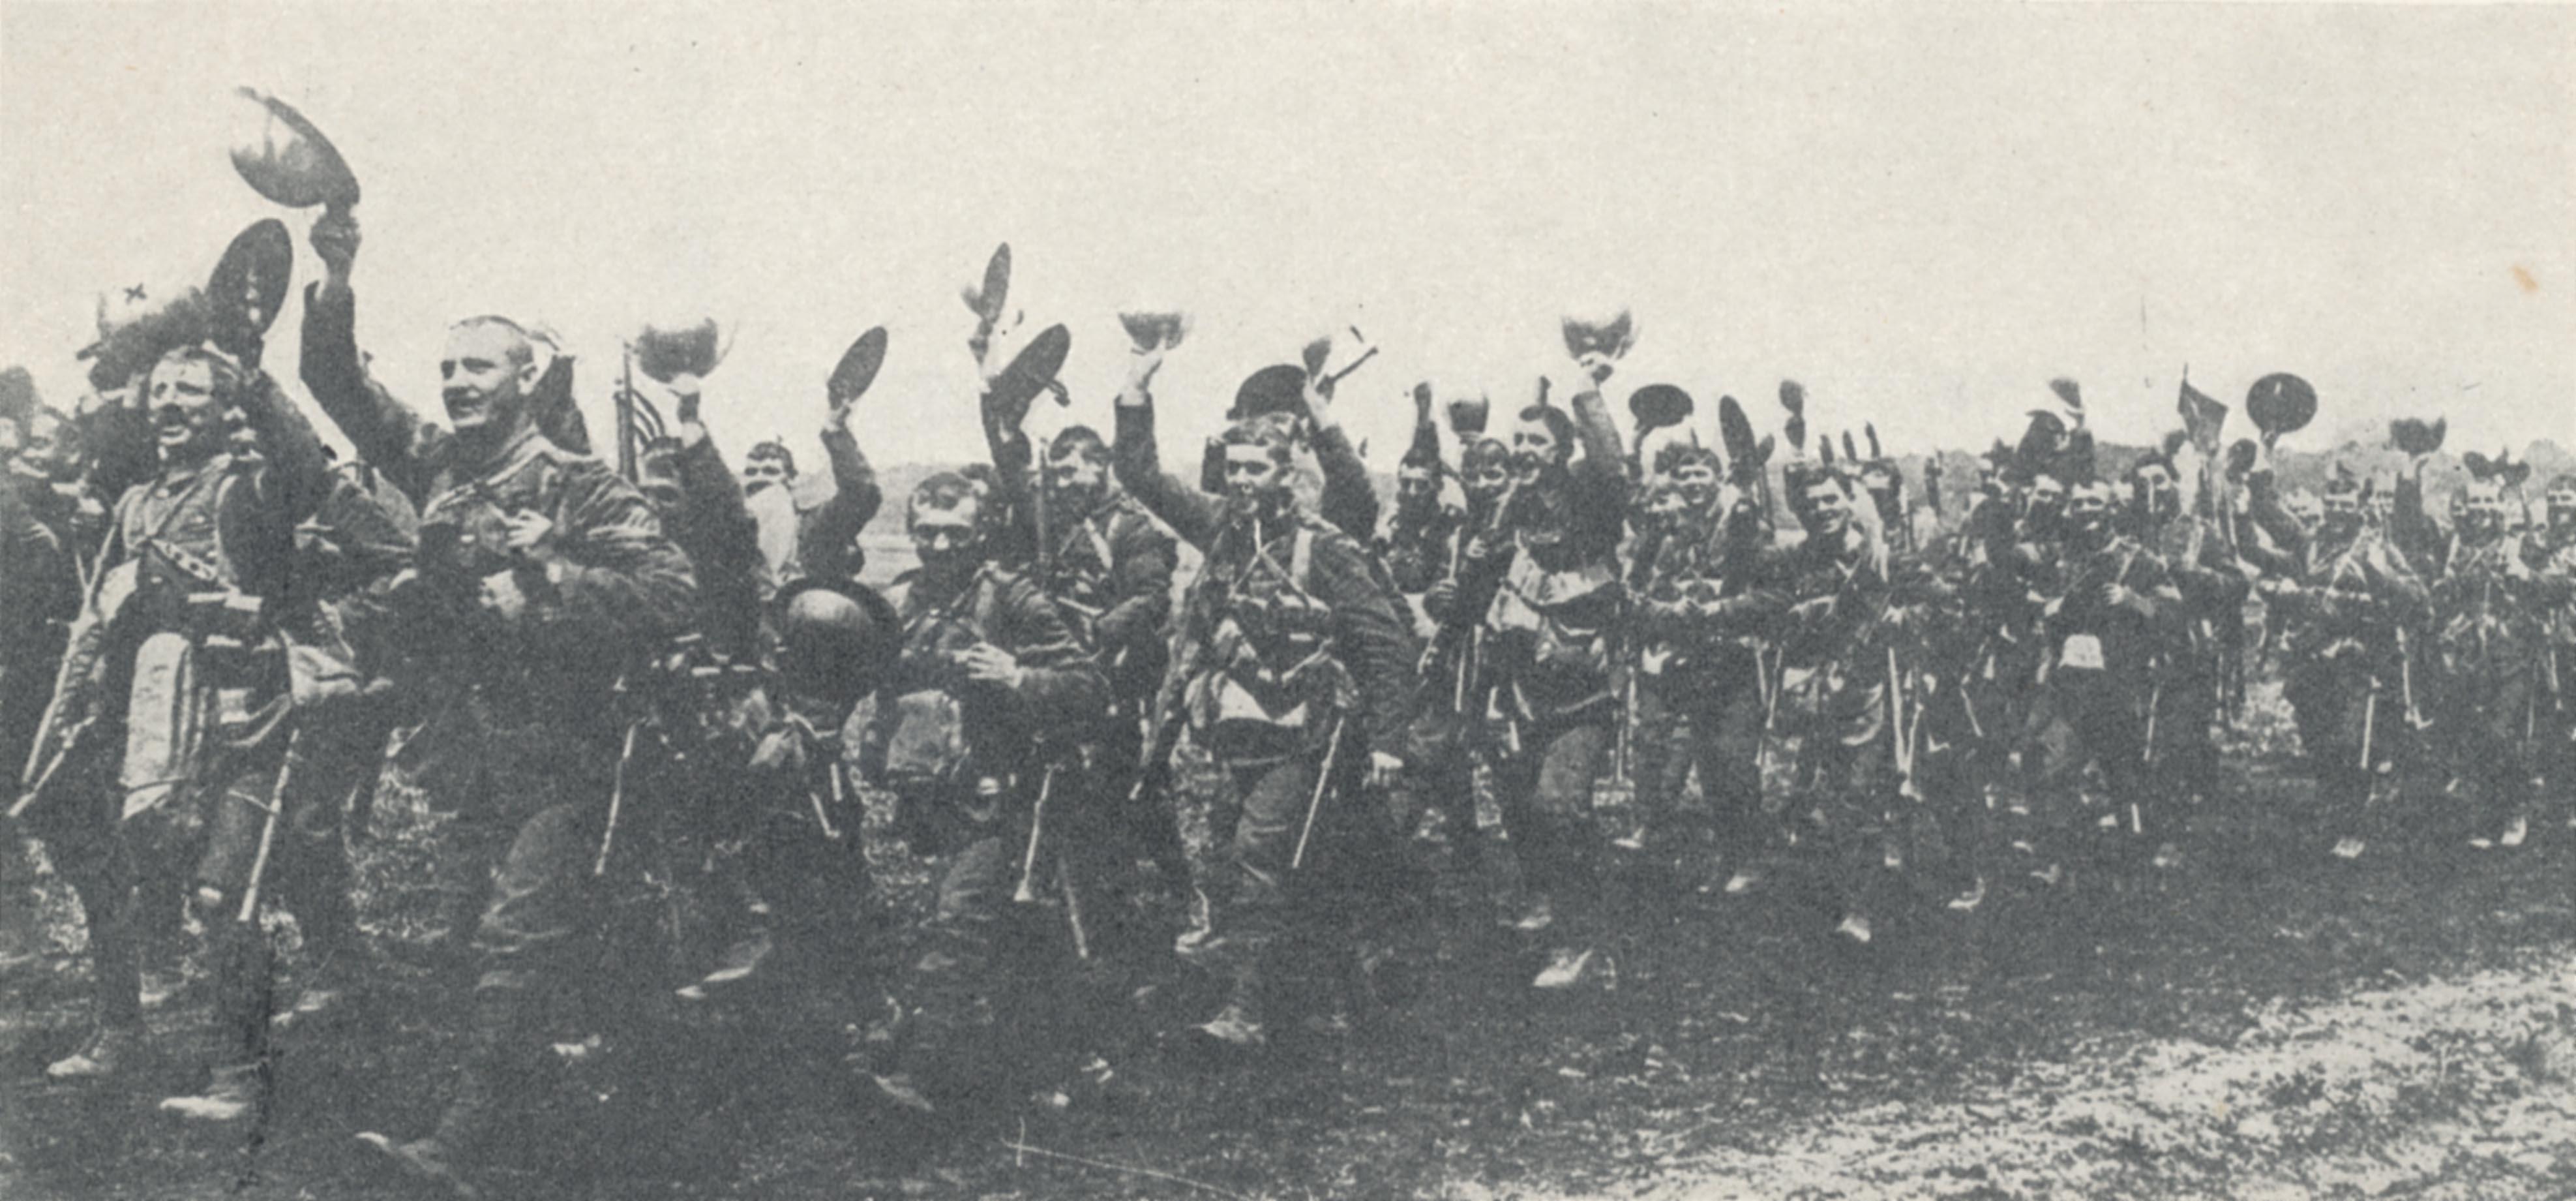 Ww1 Army Personnel